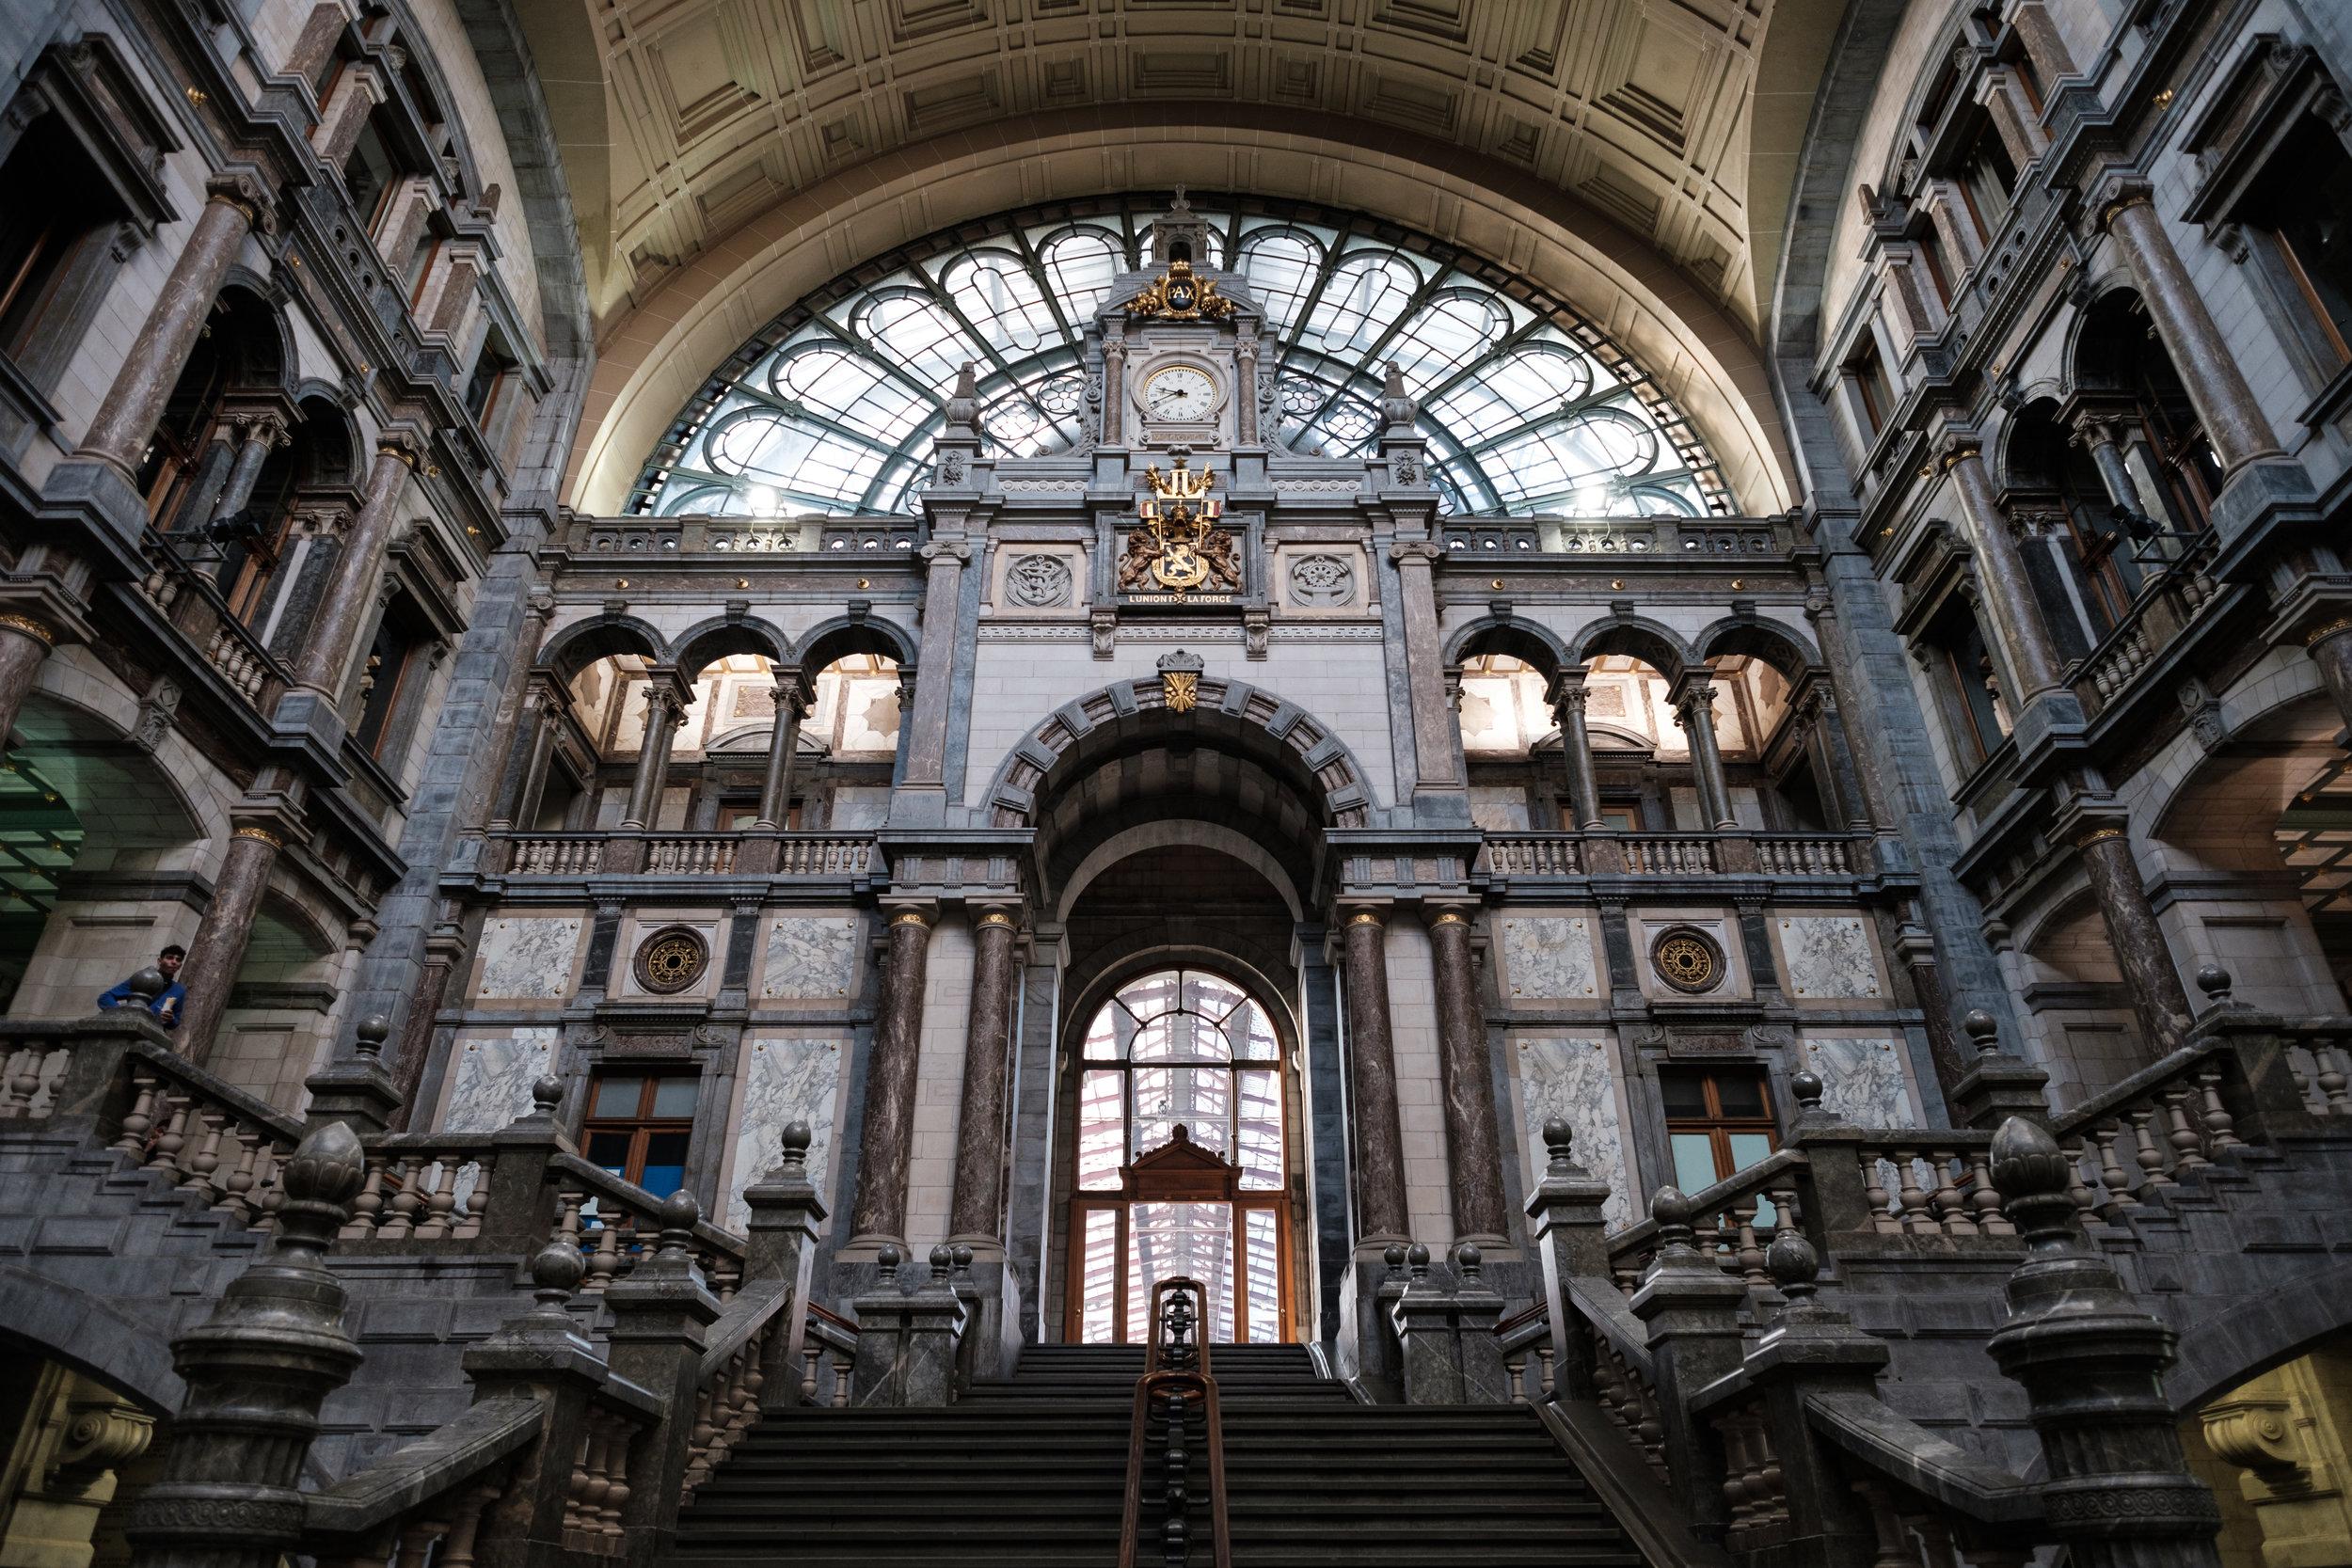 Antwerp Main Train Station,  Belgium , Fujifilm X-Pro2, XF 14mm f/2.8 R @ f/2.8